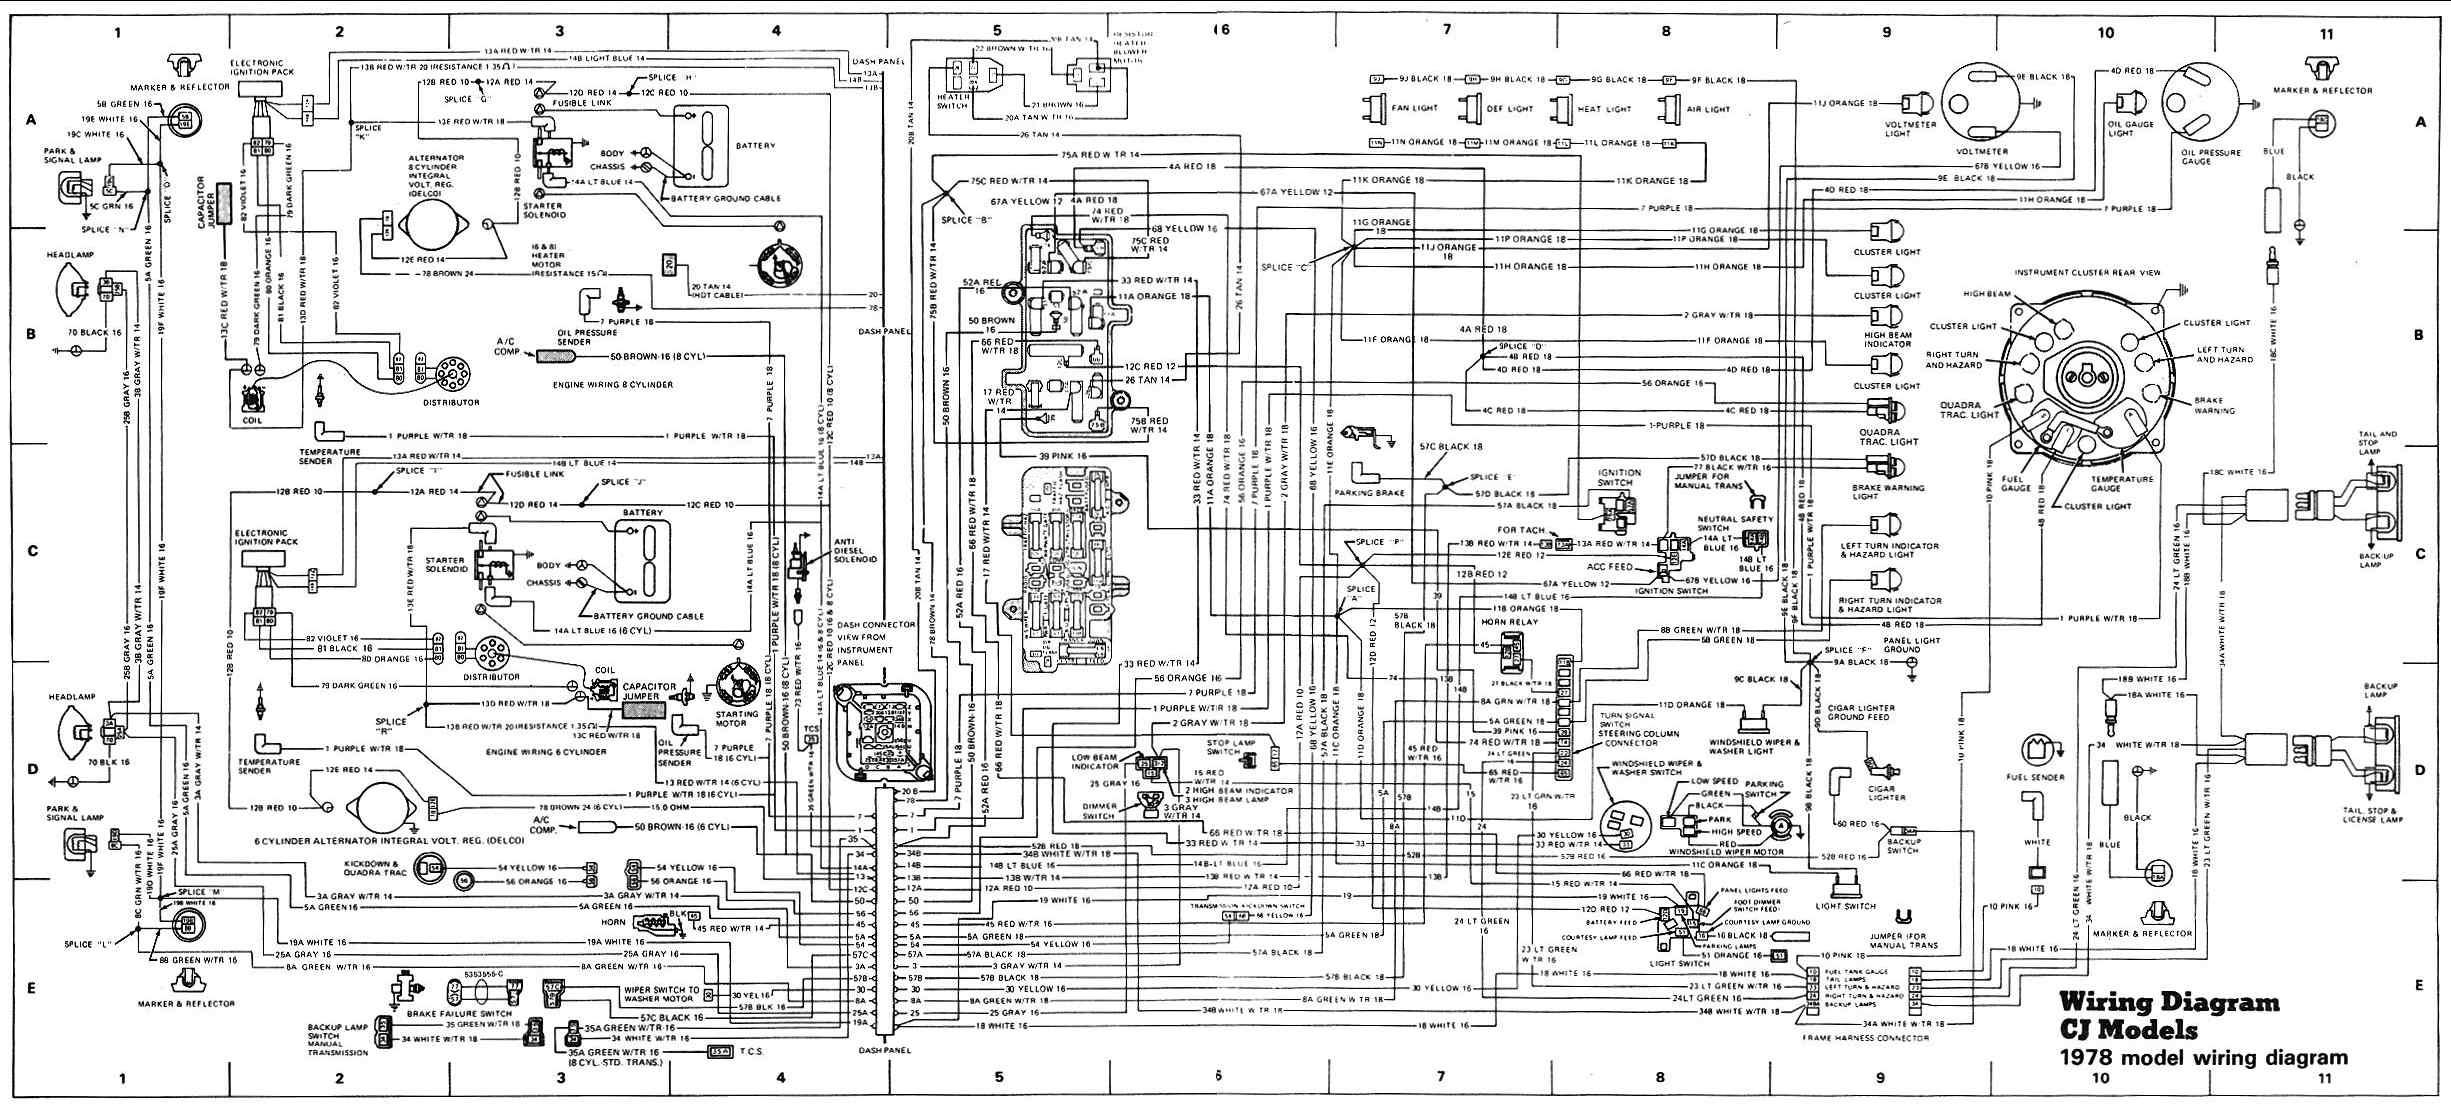 cj8 wiring harness diagram simple wiring post fuse box diagram fuse panel diagram cj8 [ 2451 x 1110 Pixel ]